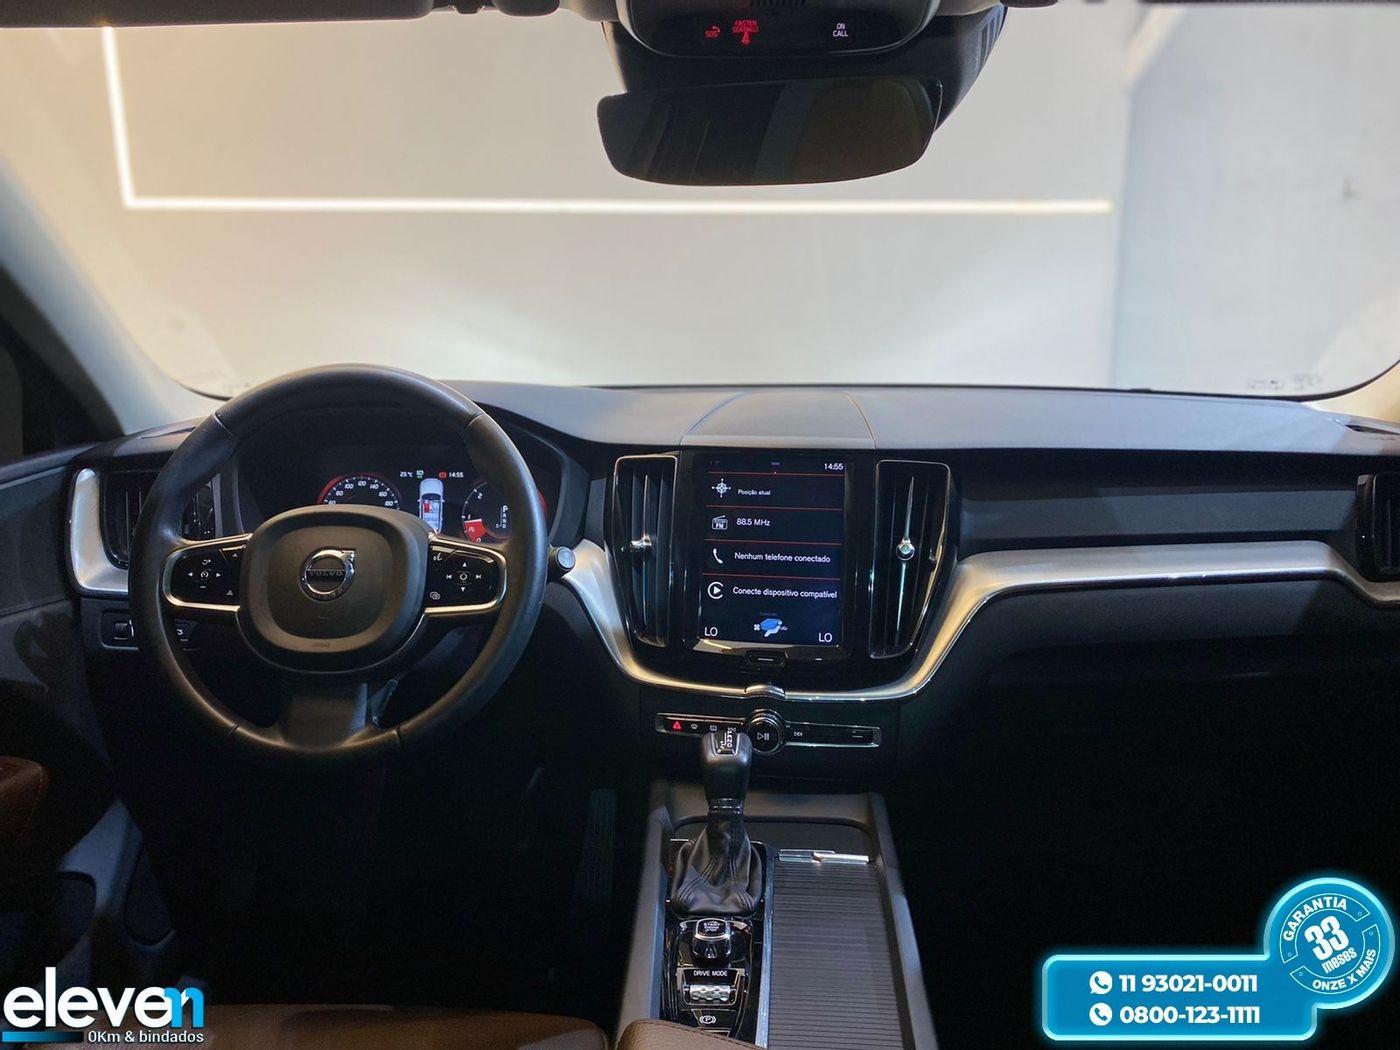 Volvo XC 60 D-5 MOMENTUM 2.0 AWD Diesel 5p